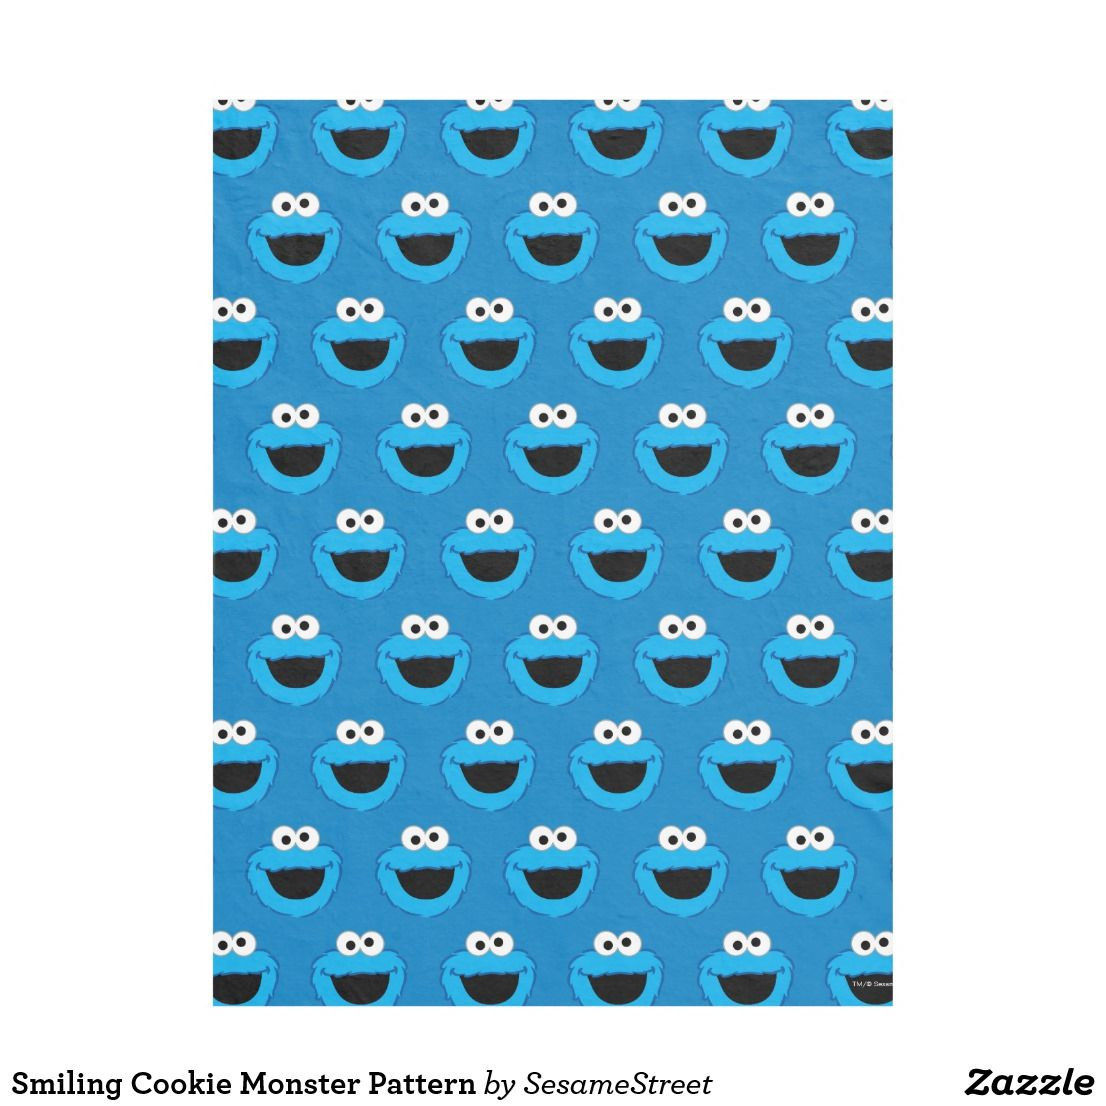 Smiling Cookie Monster Pattern Fleece Blanket Zazzle Com Monster Cookies Duvet Cover Pattern Fleece Blanket